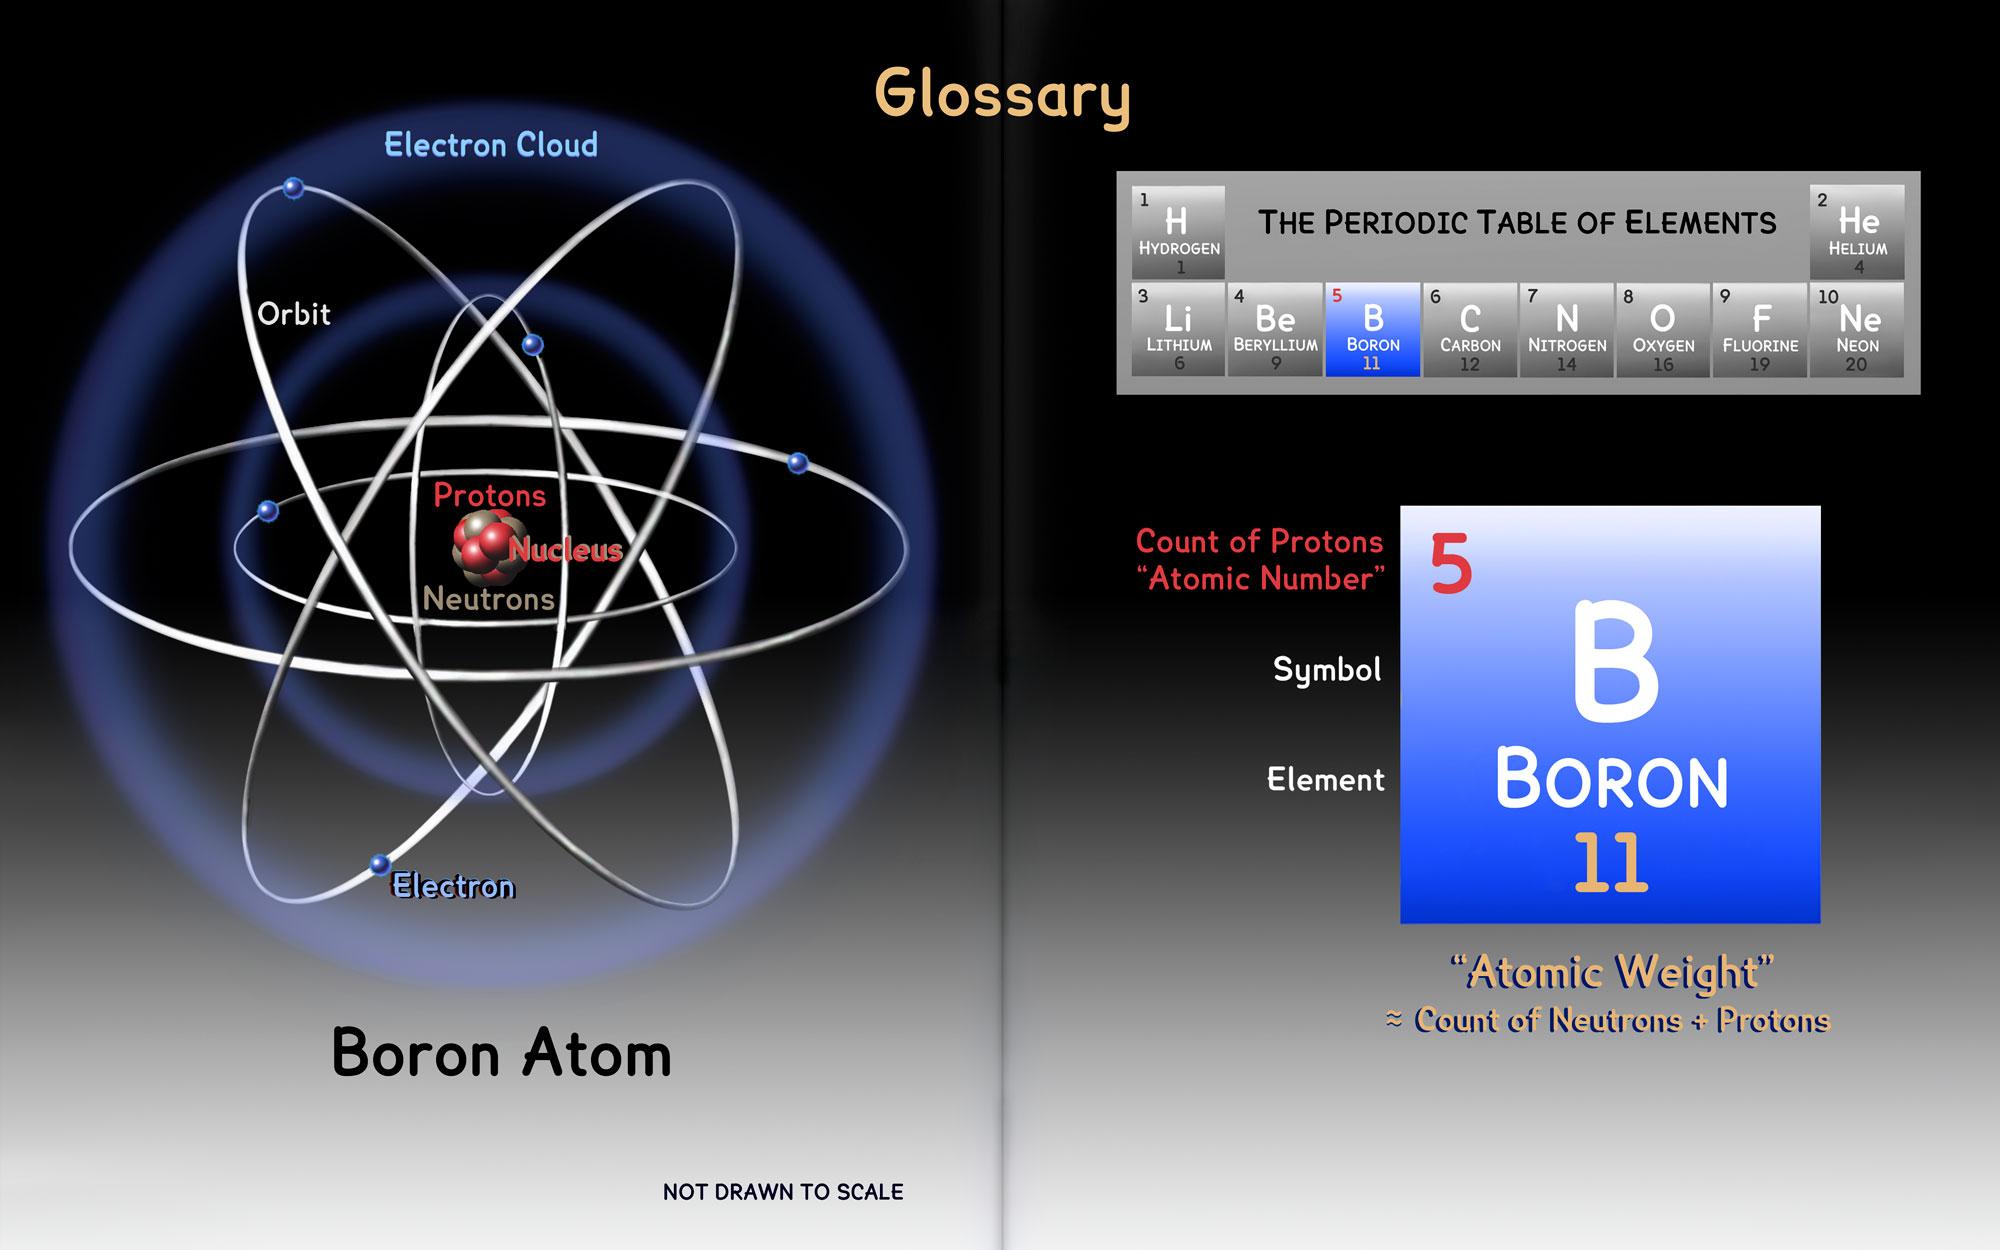 DF-E-5-B-Boron-Glossary